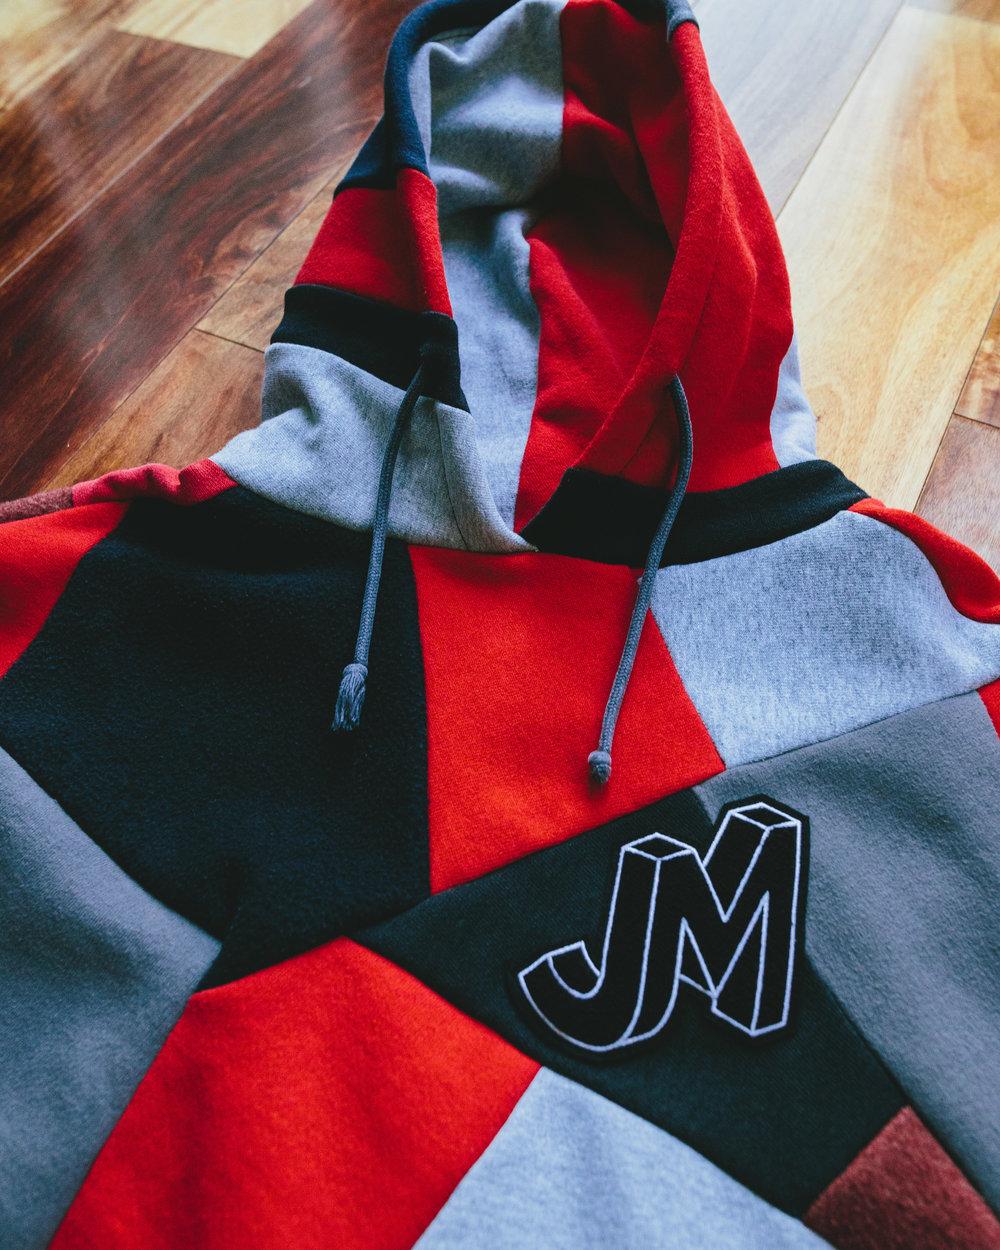 jmsweater-1005.jpg